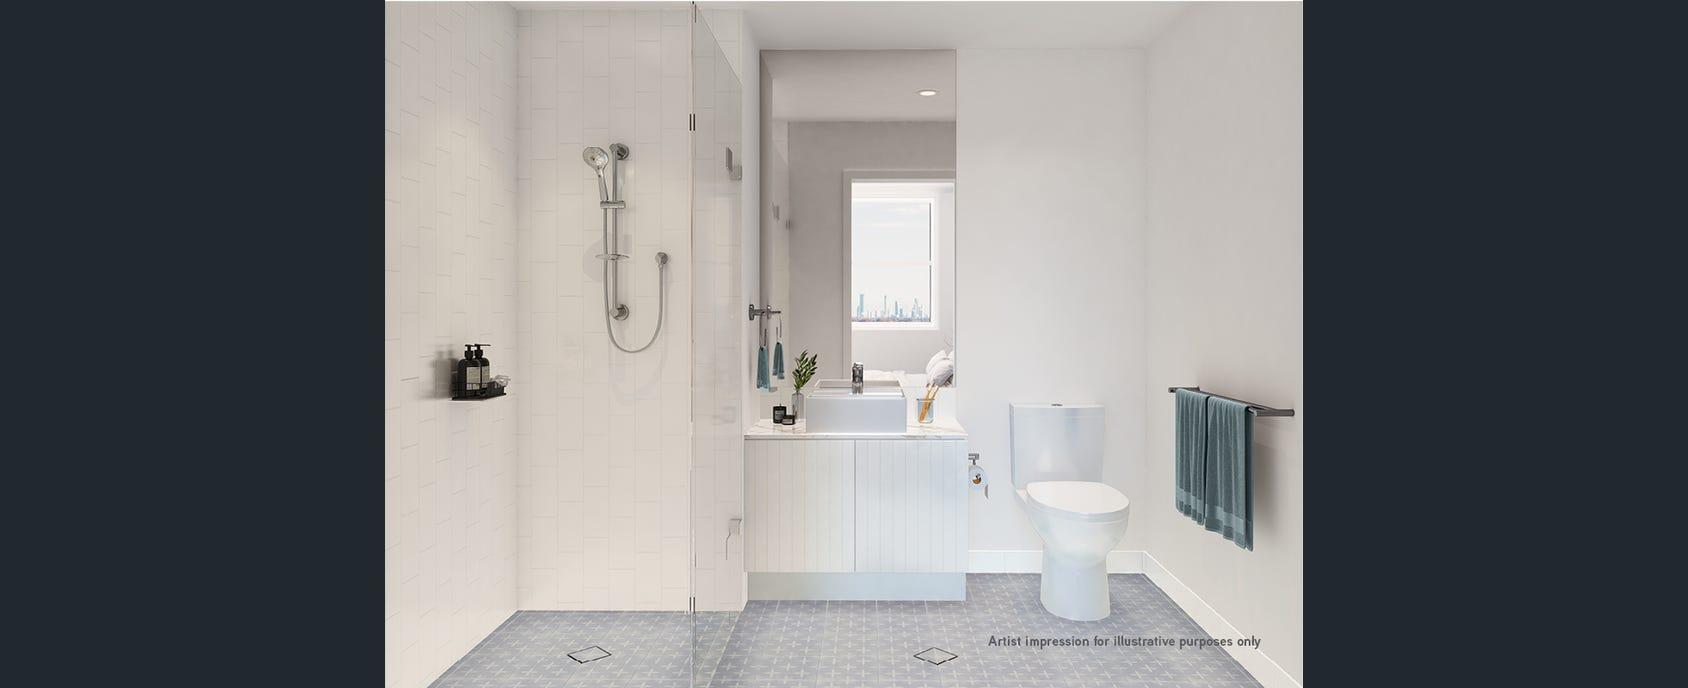 33255752__1624418441-12029-Bathroom.jpg